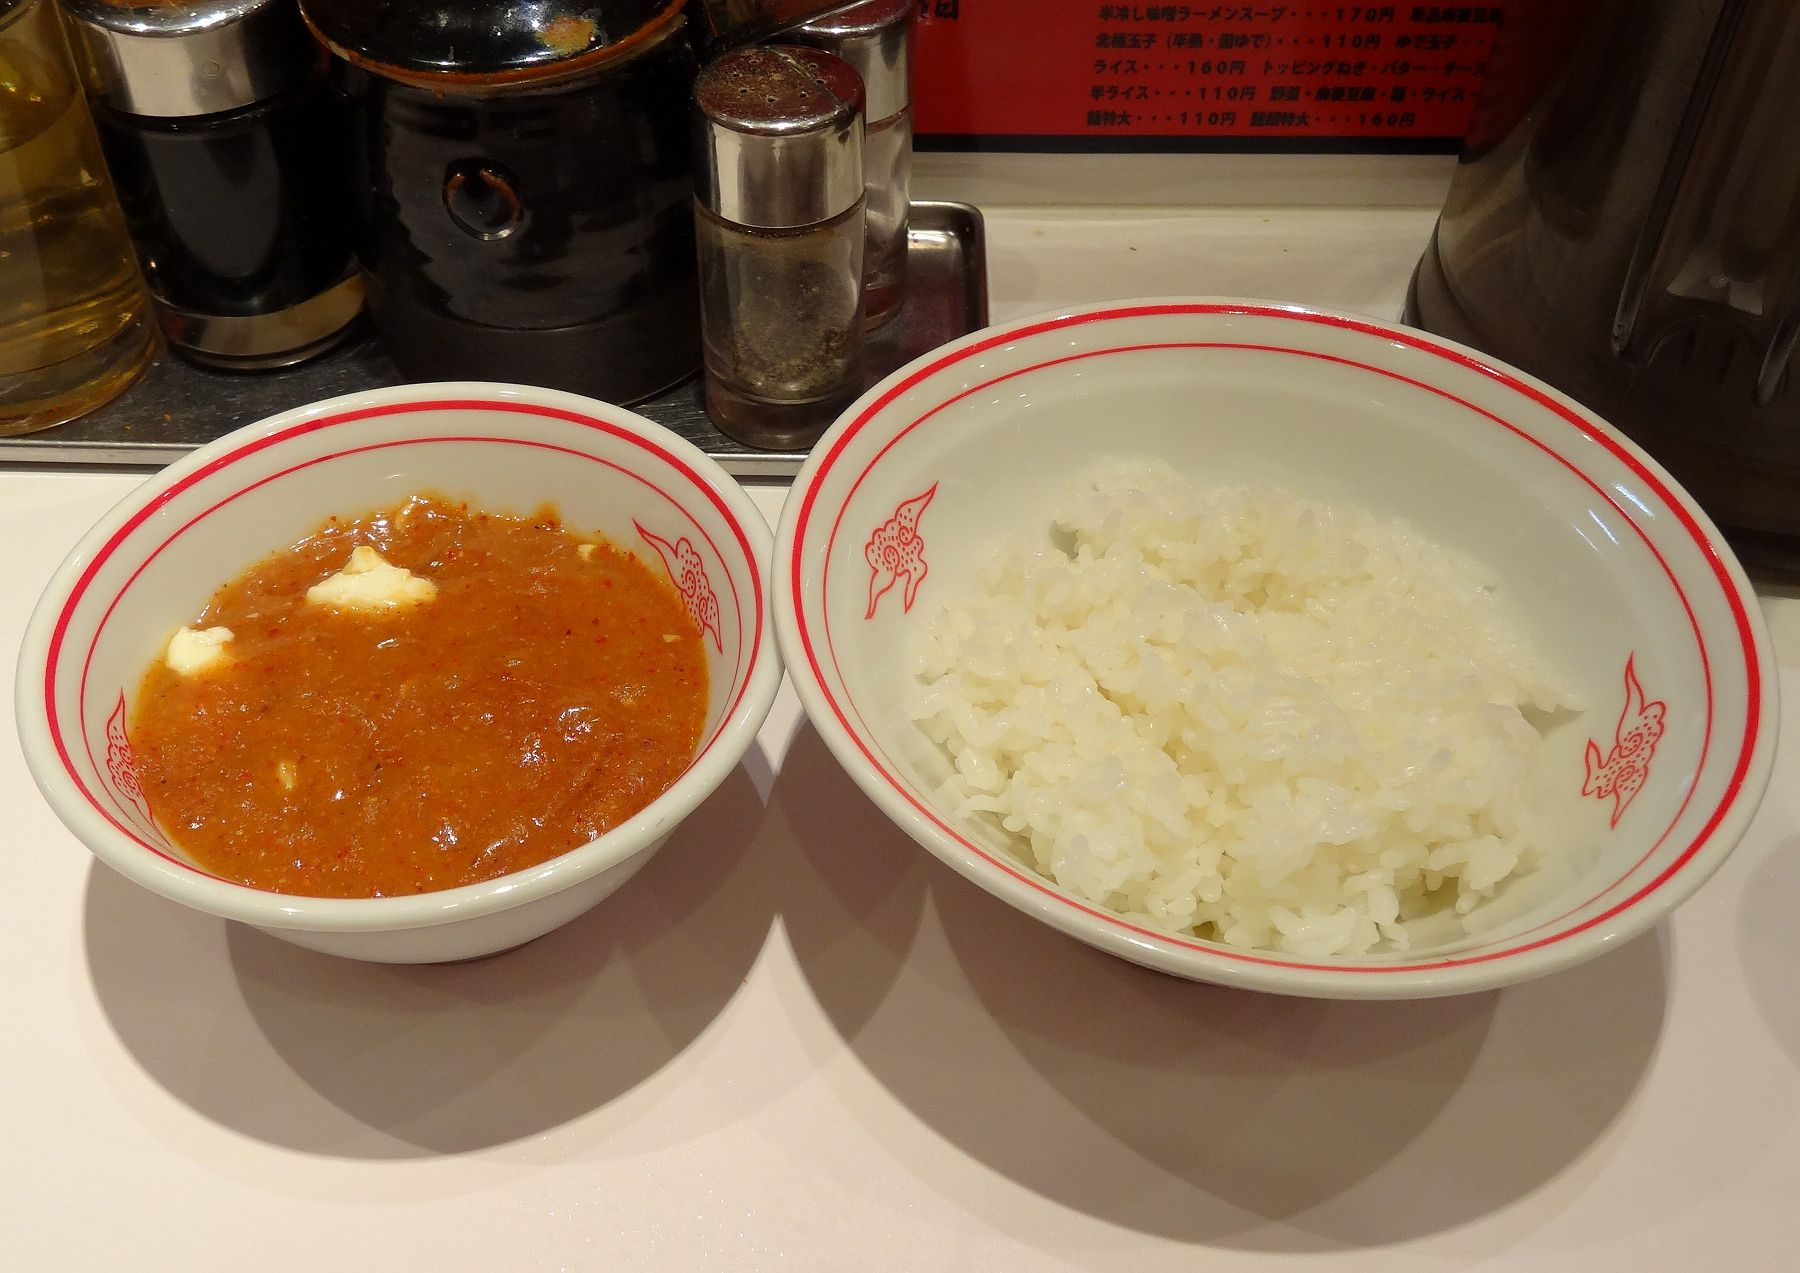 20120812014nakamotoshinjyuku.jpg